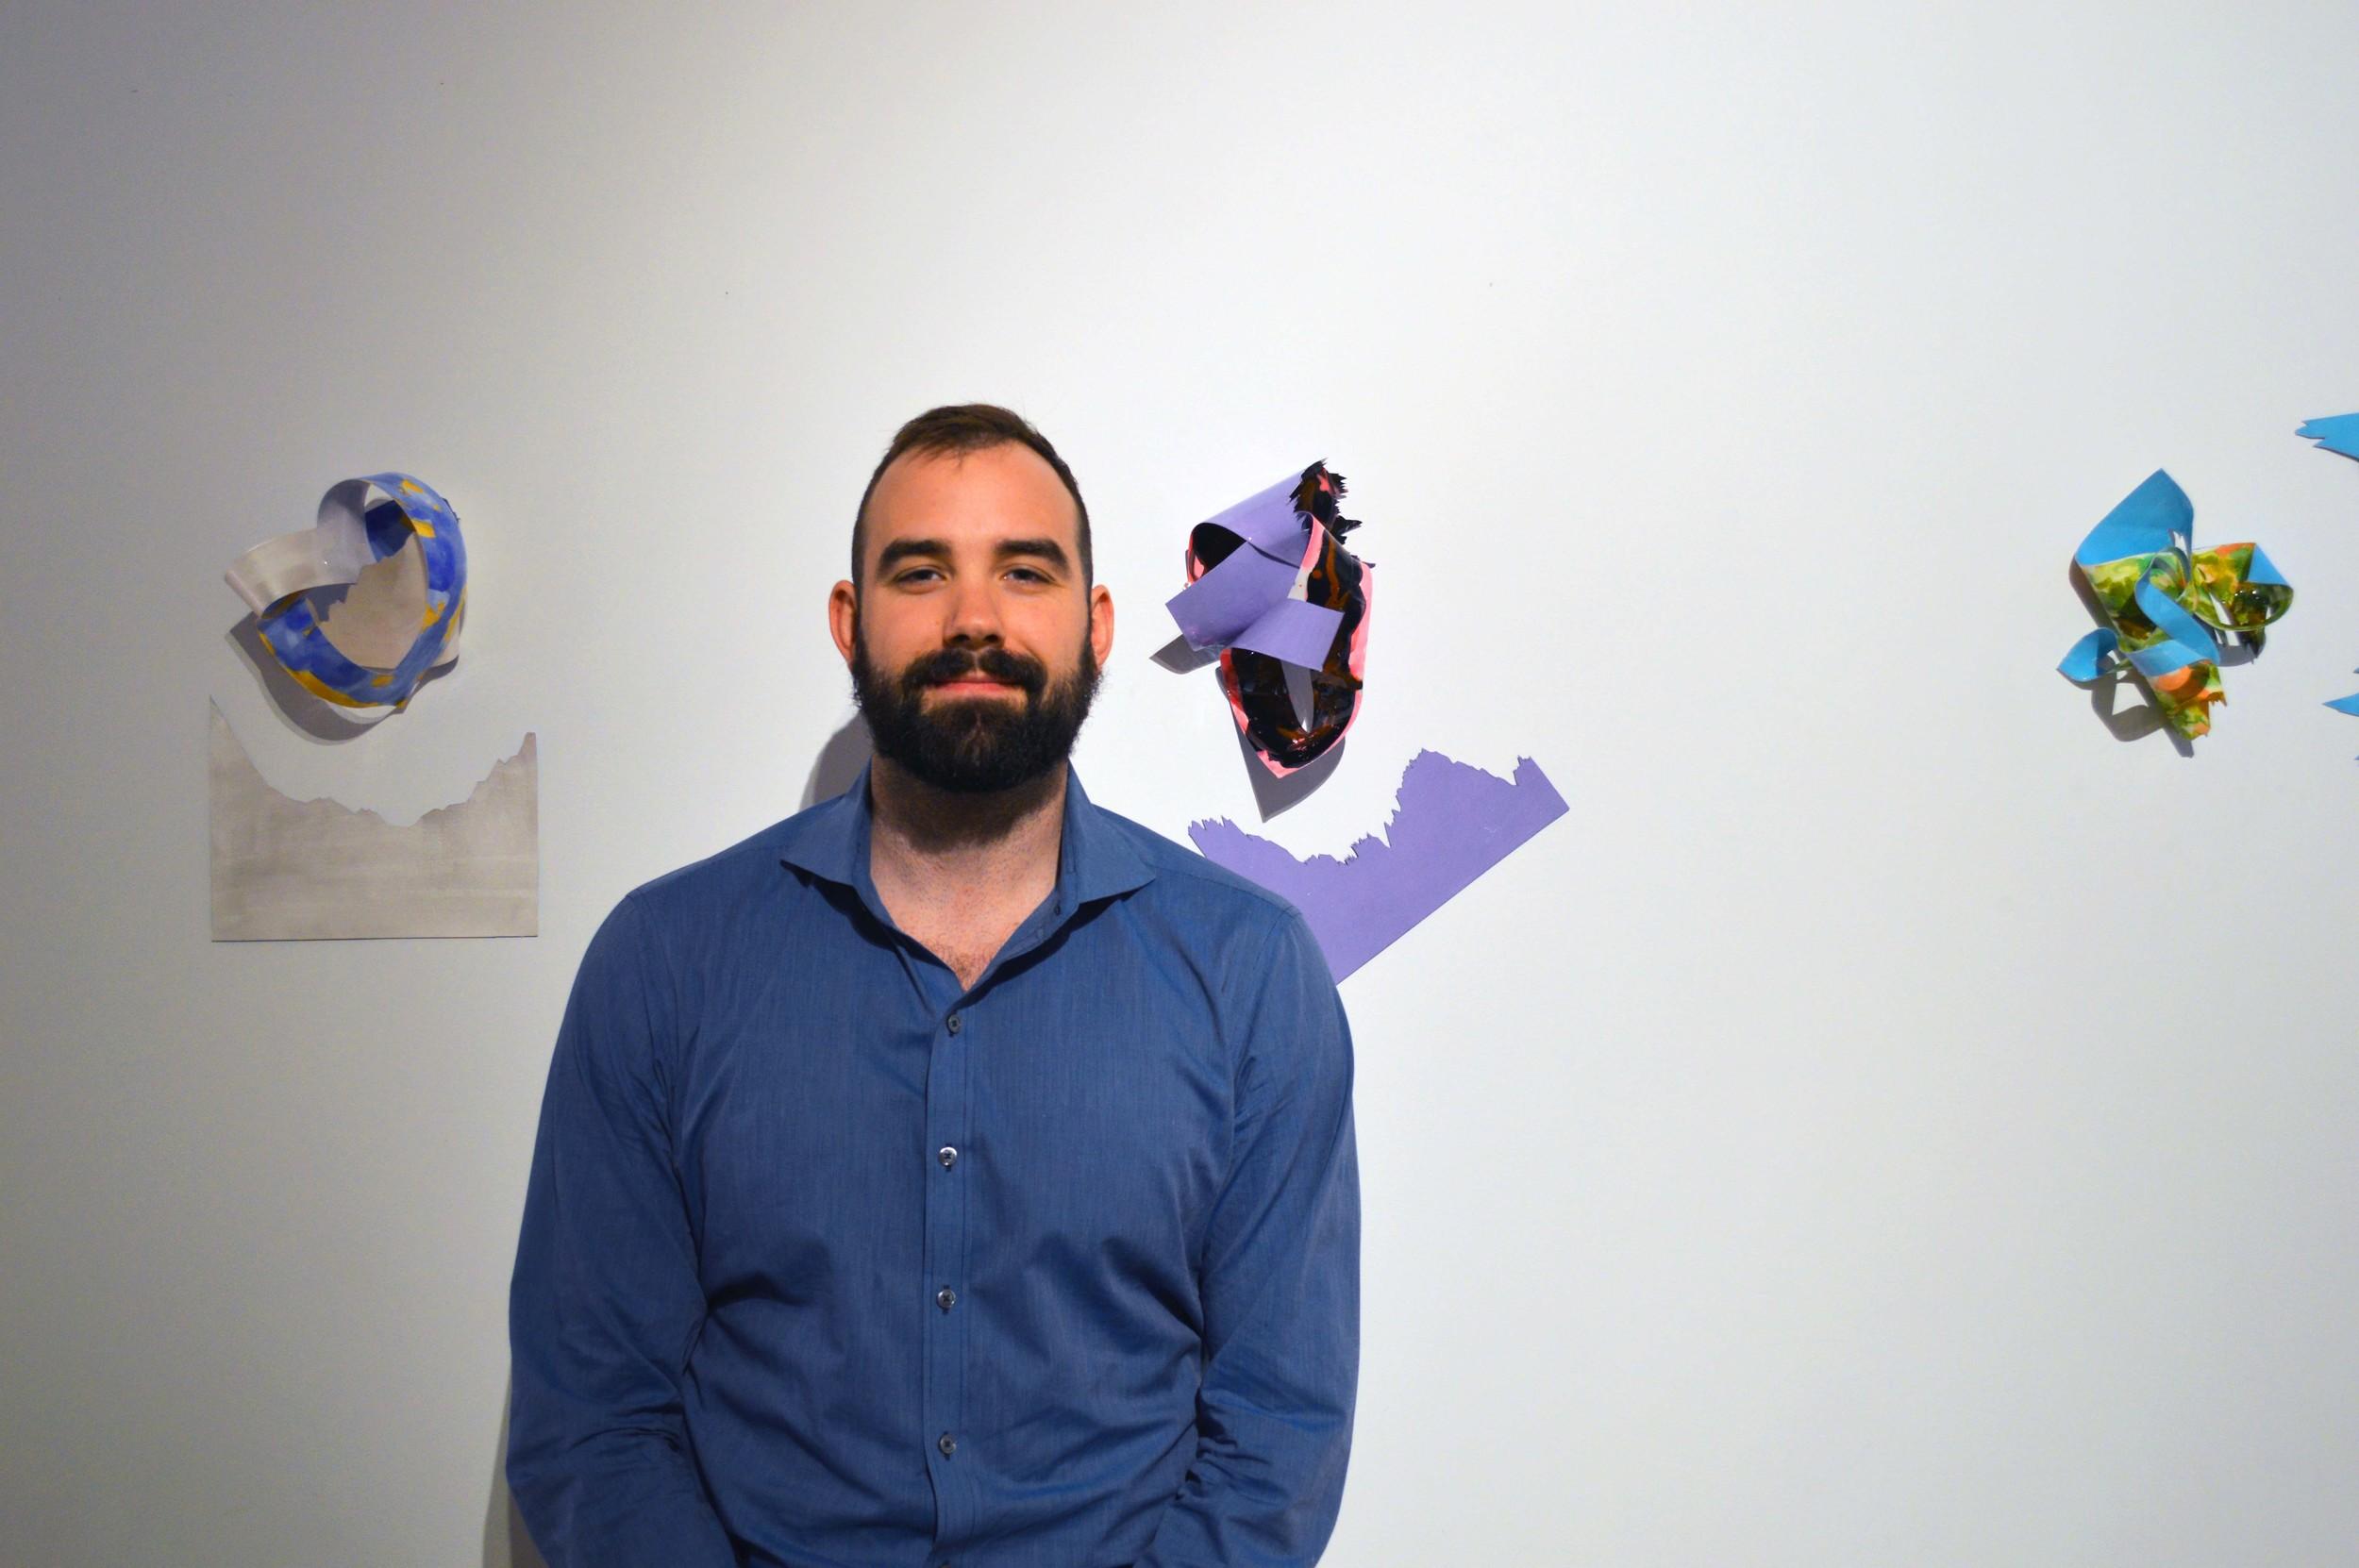 David Temchulla and his work.